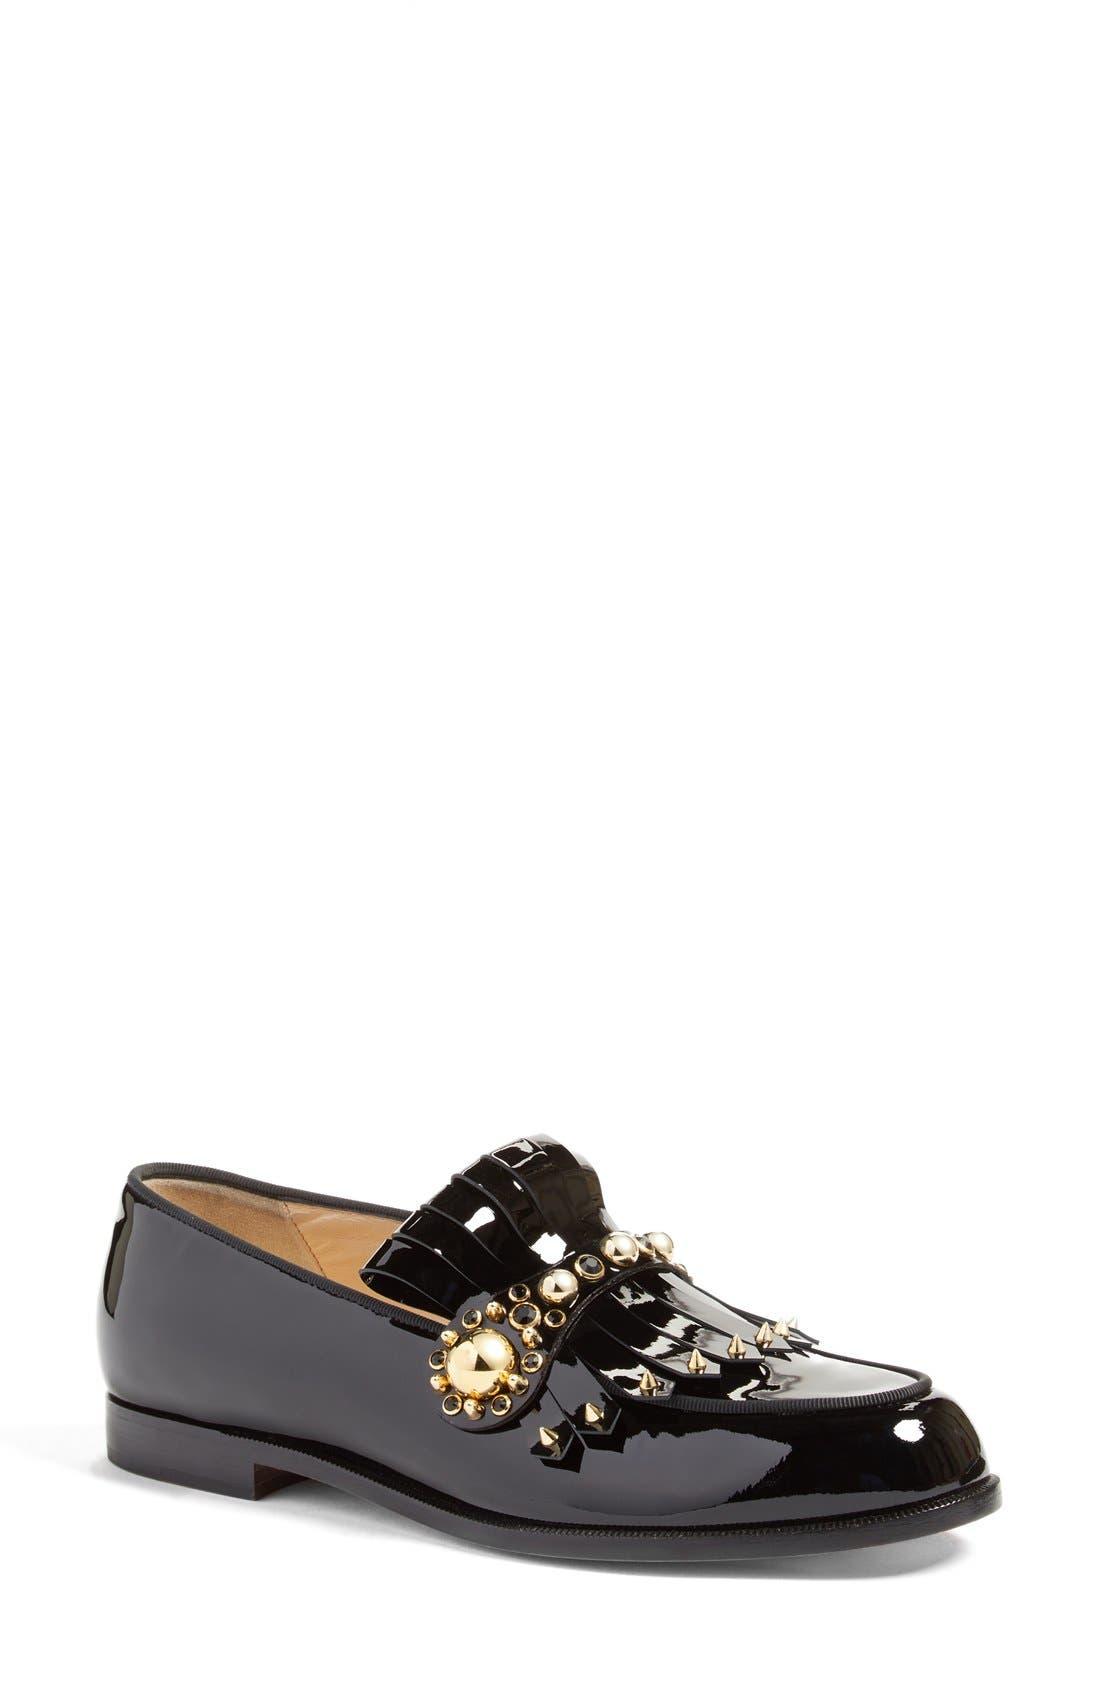 Main Image - Christian Louboutin Octavian Embellished Kilted Loafer